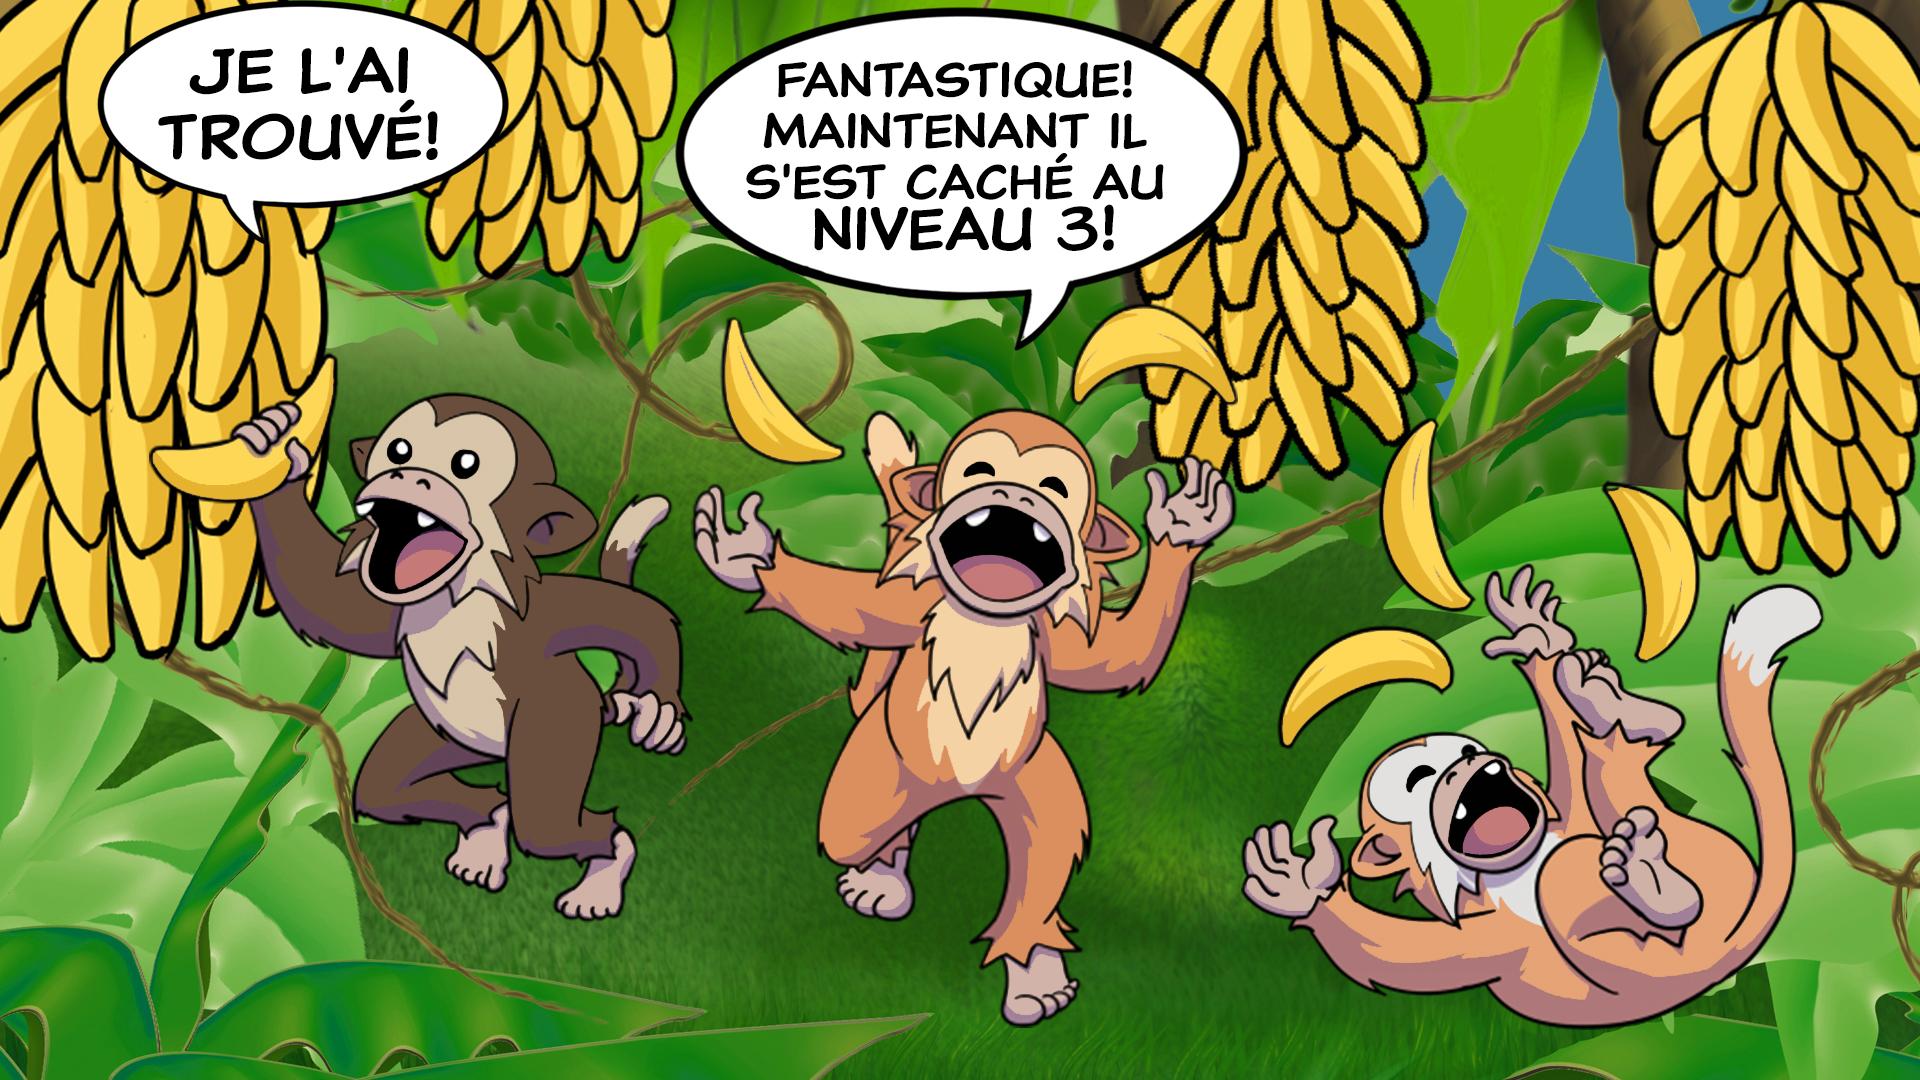 biki-lvl3-gate-french